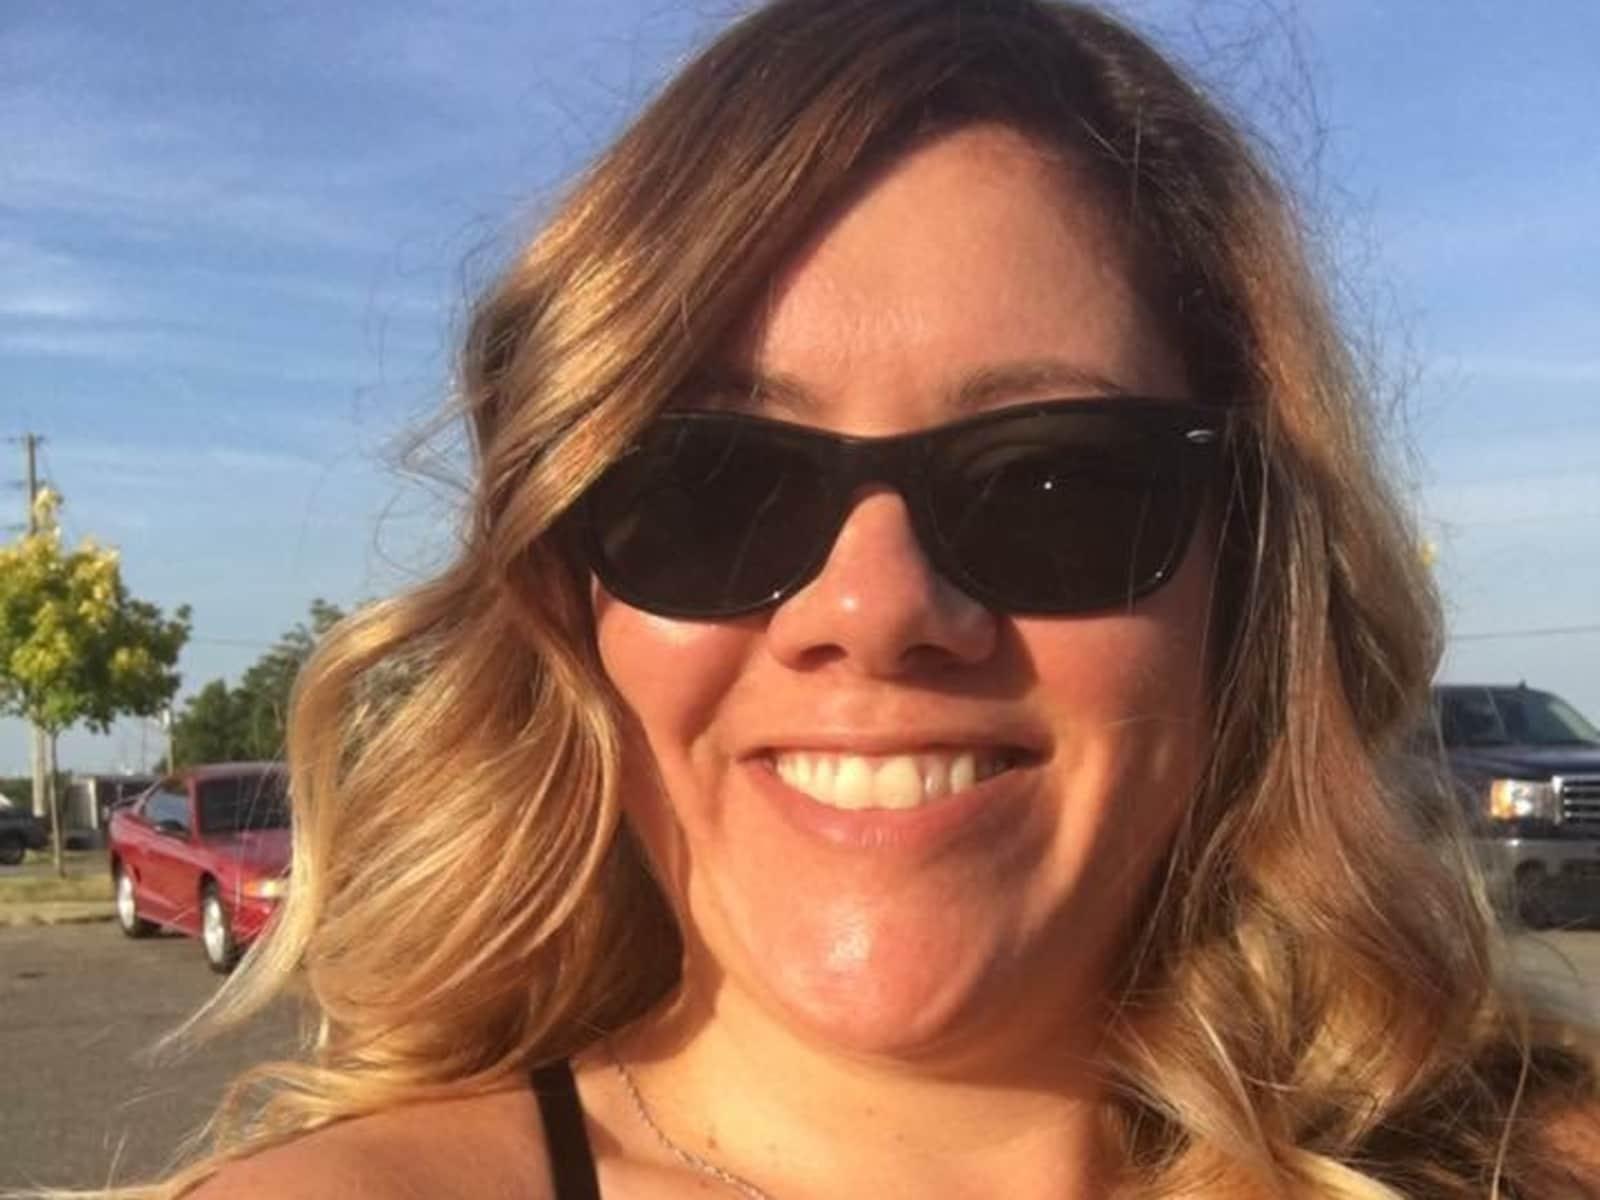 Alexis from Orangeville, Ontario, Canada